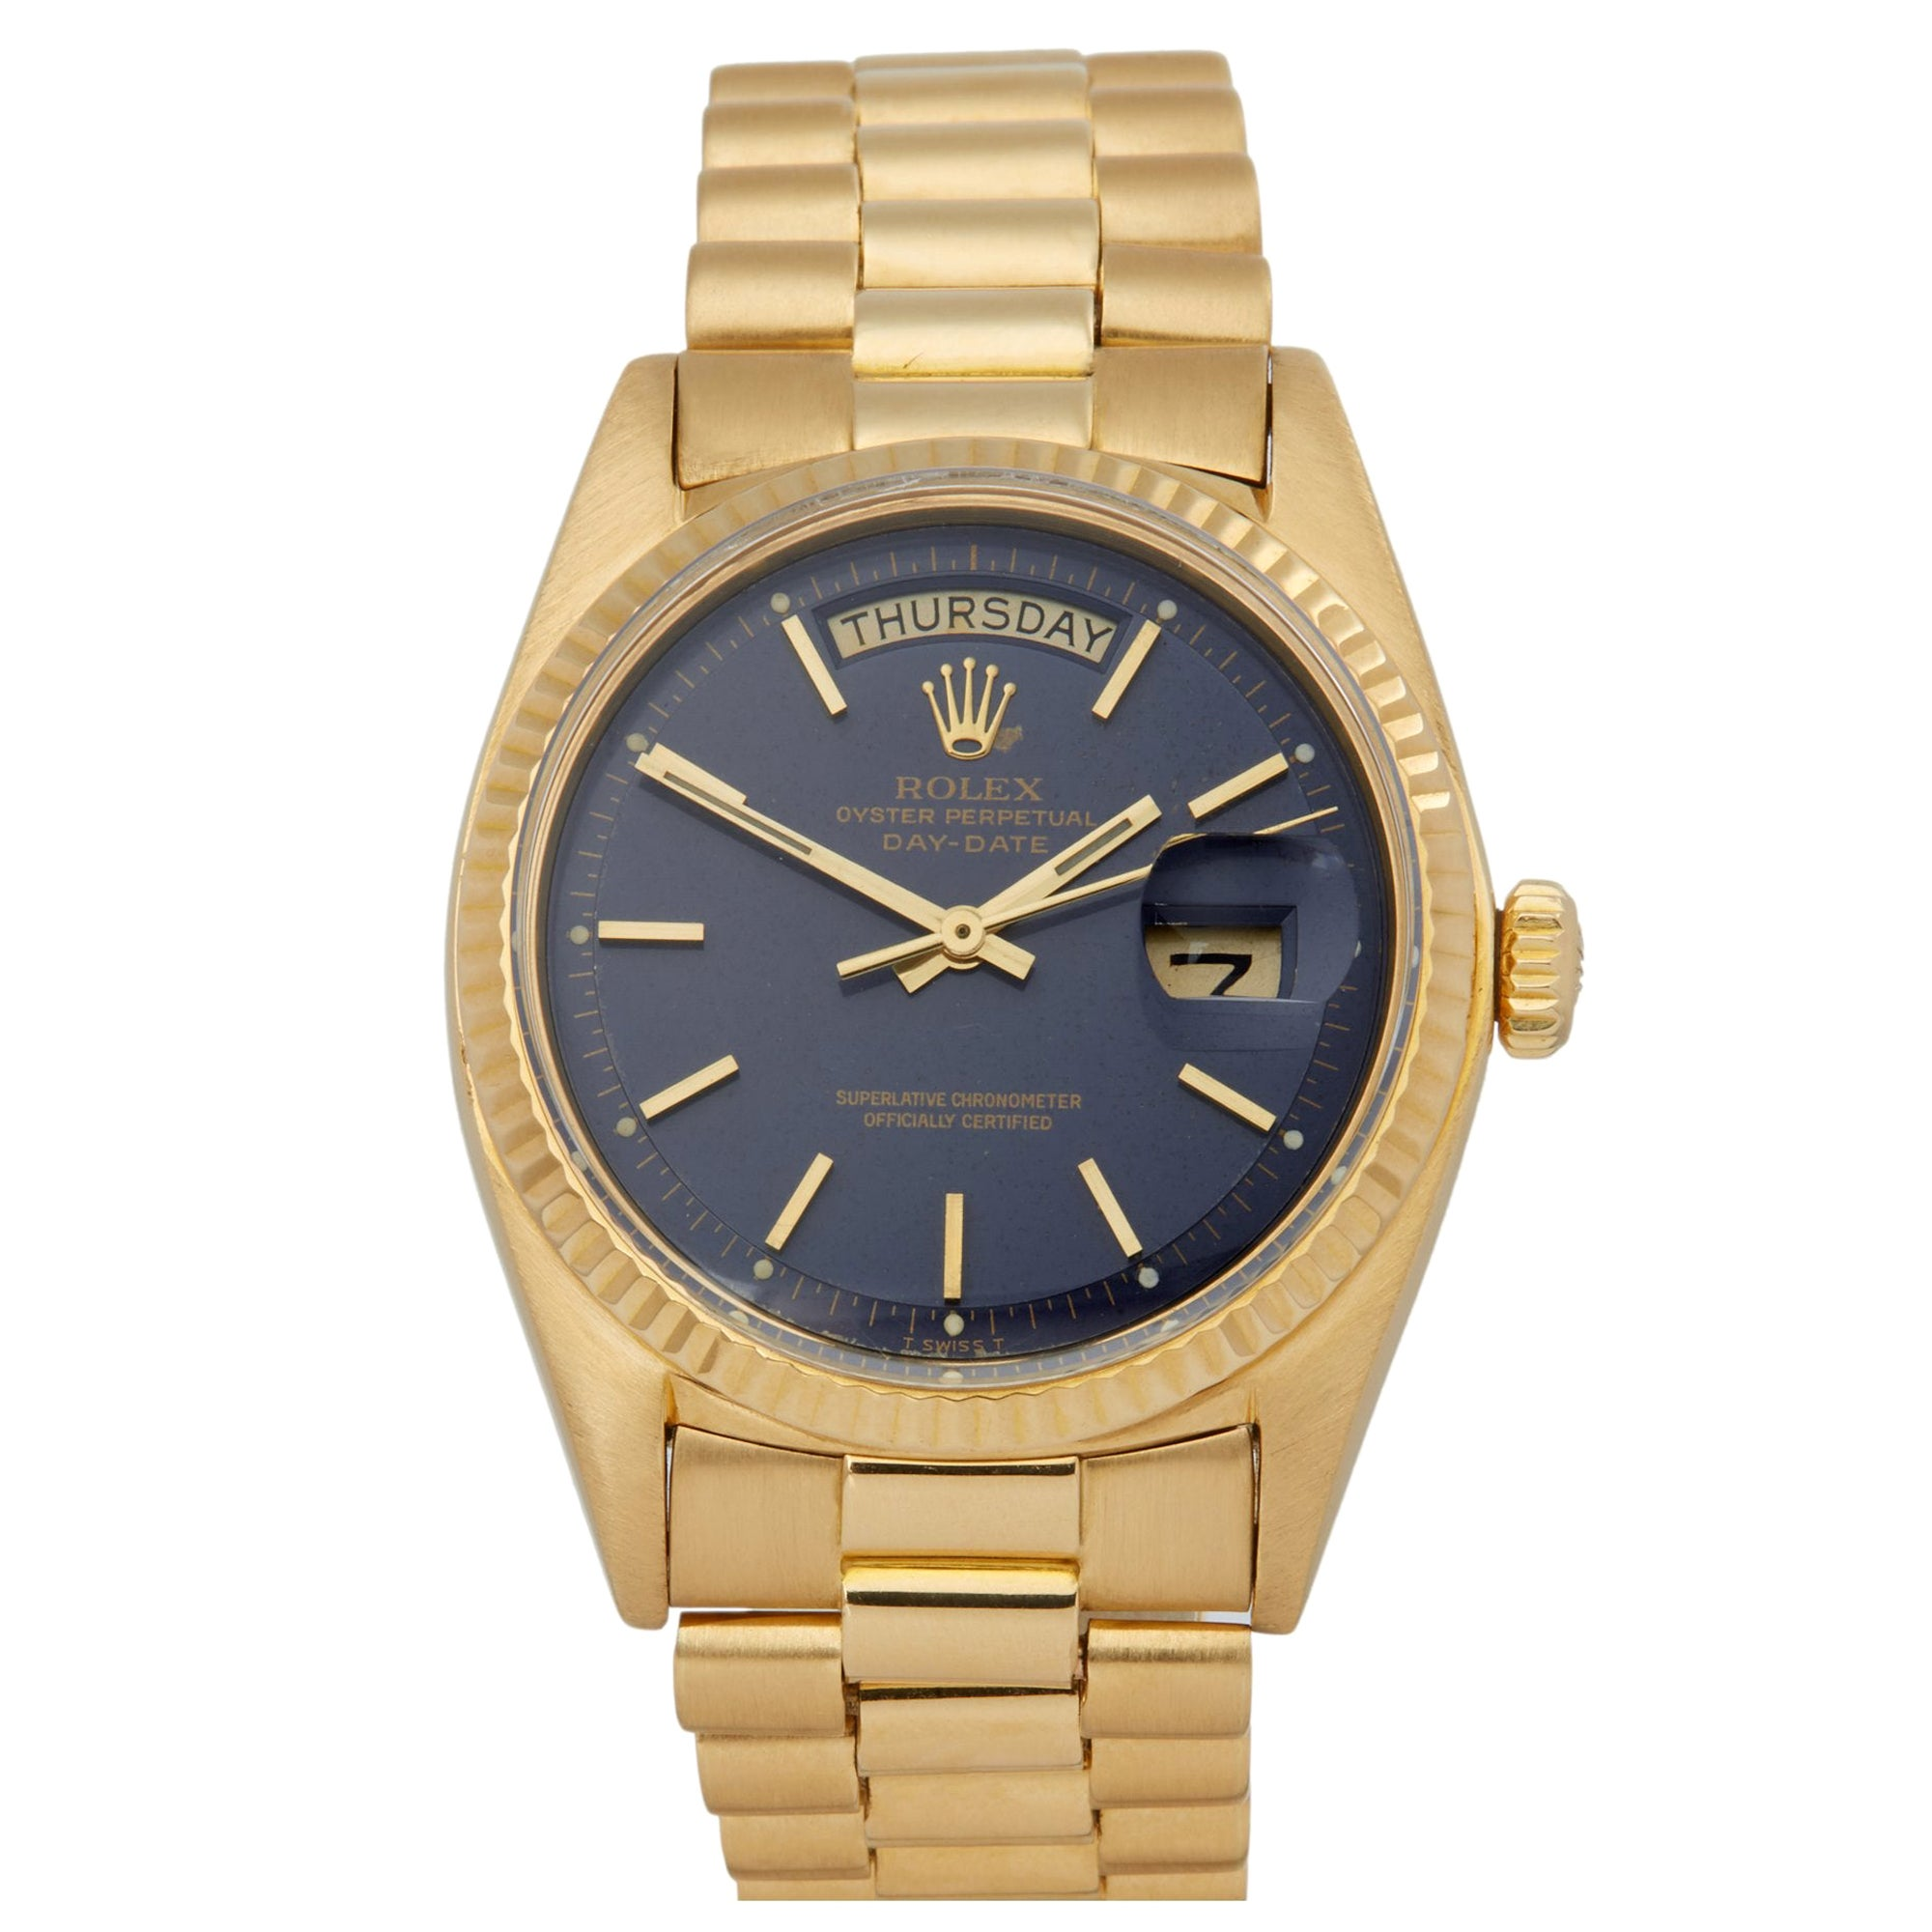 Rolex Day-Date 36 1803 Unisex Yellow Gold Watch